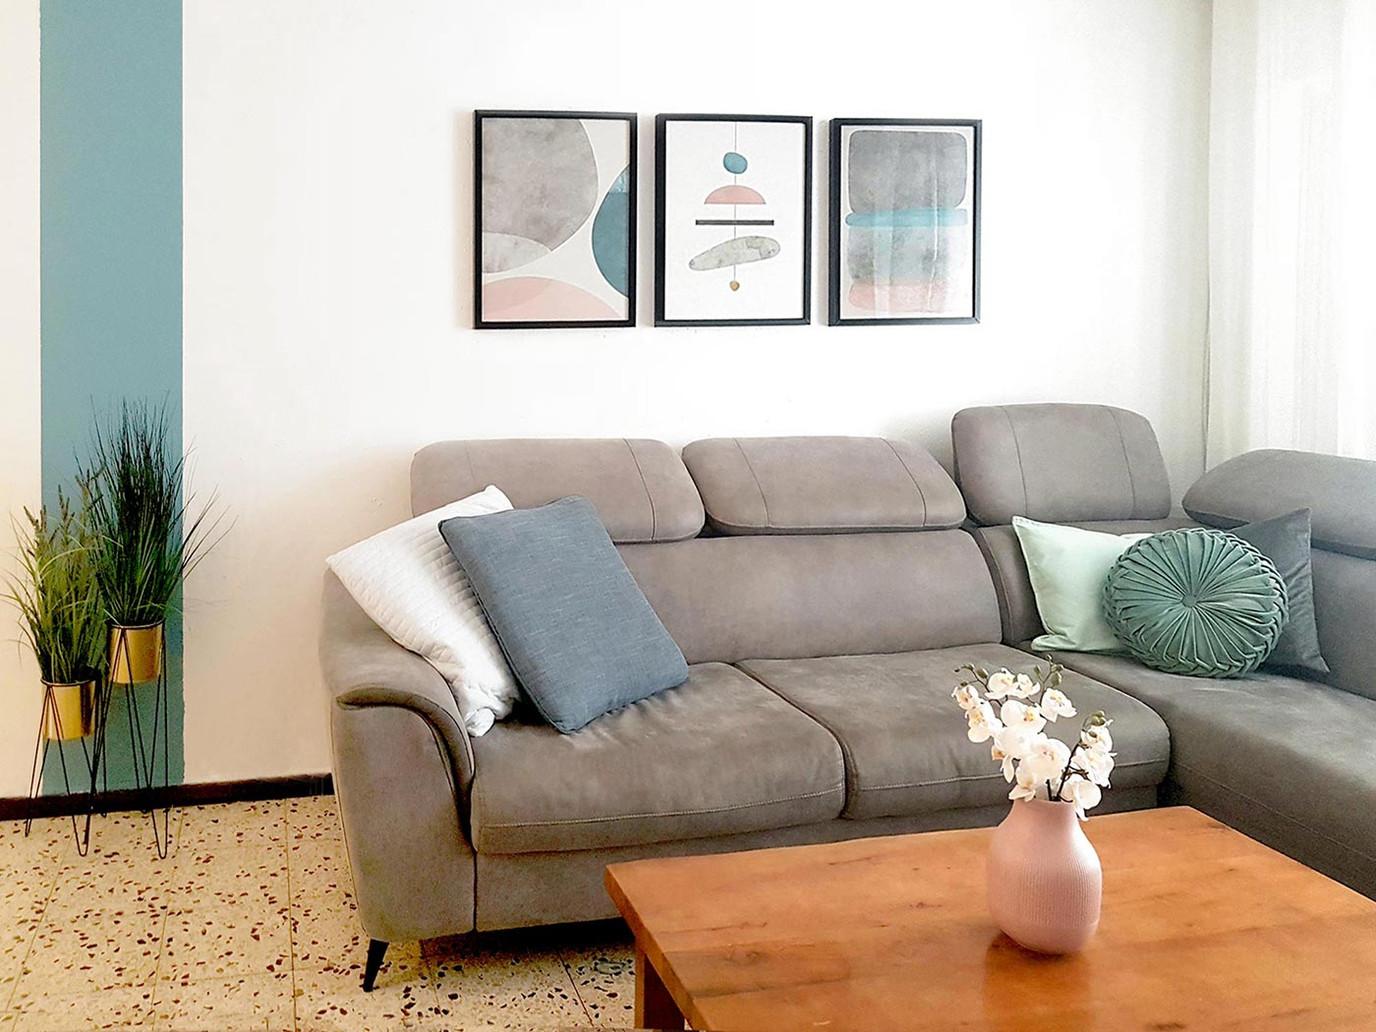 Ilanit-Hanuka-shandelier-set-0f-3-living